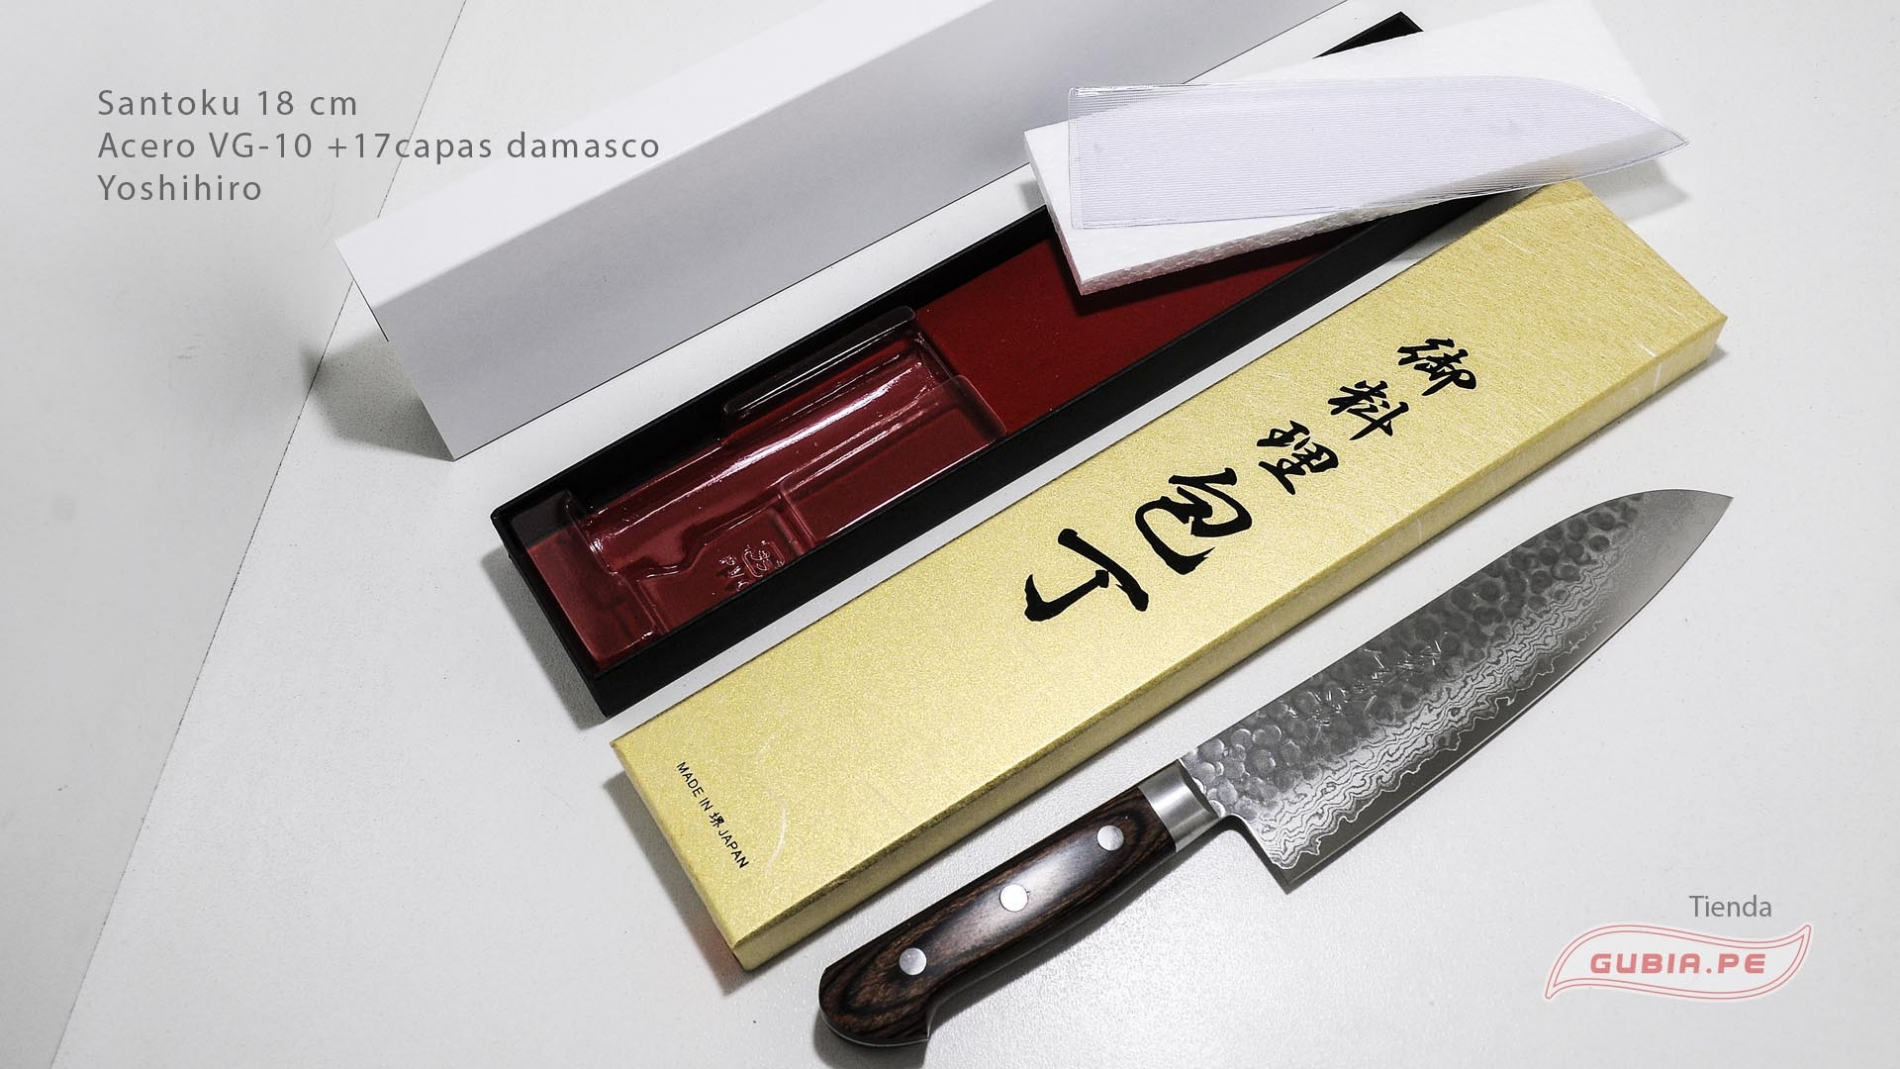 HAAs18-Cuchillo Santoku 18 cm acero VG-10+damasco Yoshihiro HAAs18-max-7.